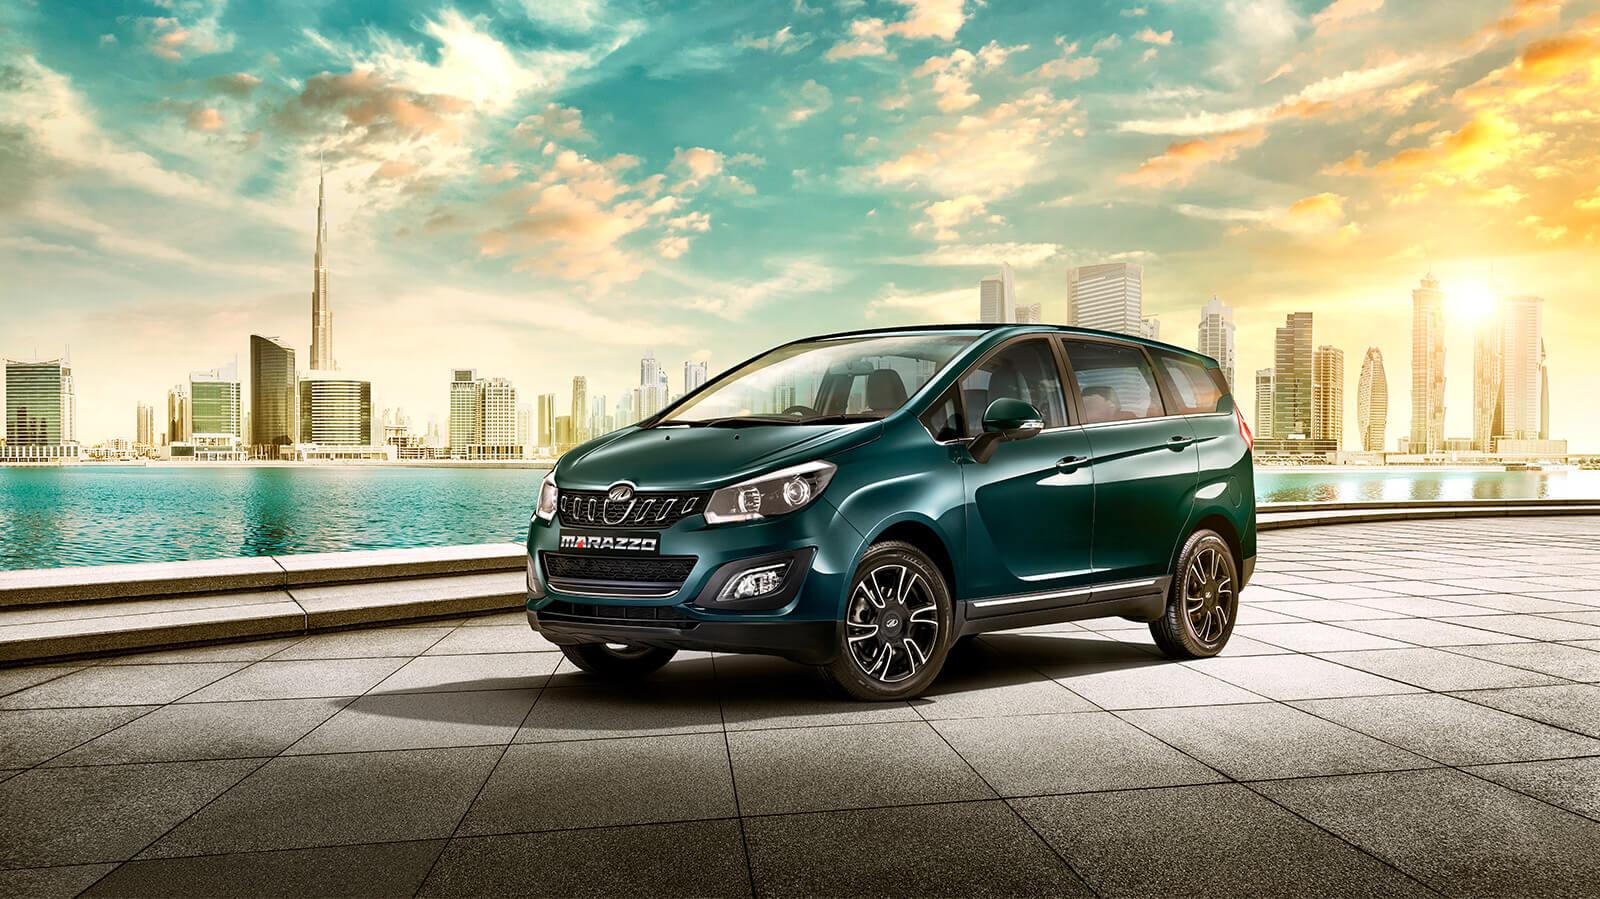 Honest Automobile Reviews Wiring Diagram Hyundai Santro India Some Highlights Of Mahindra Marrazo